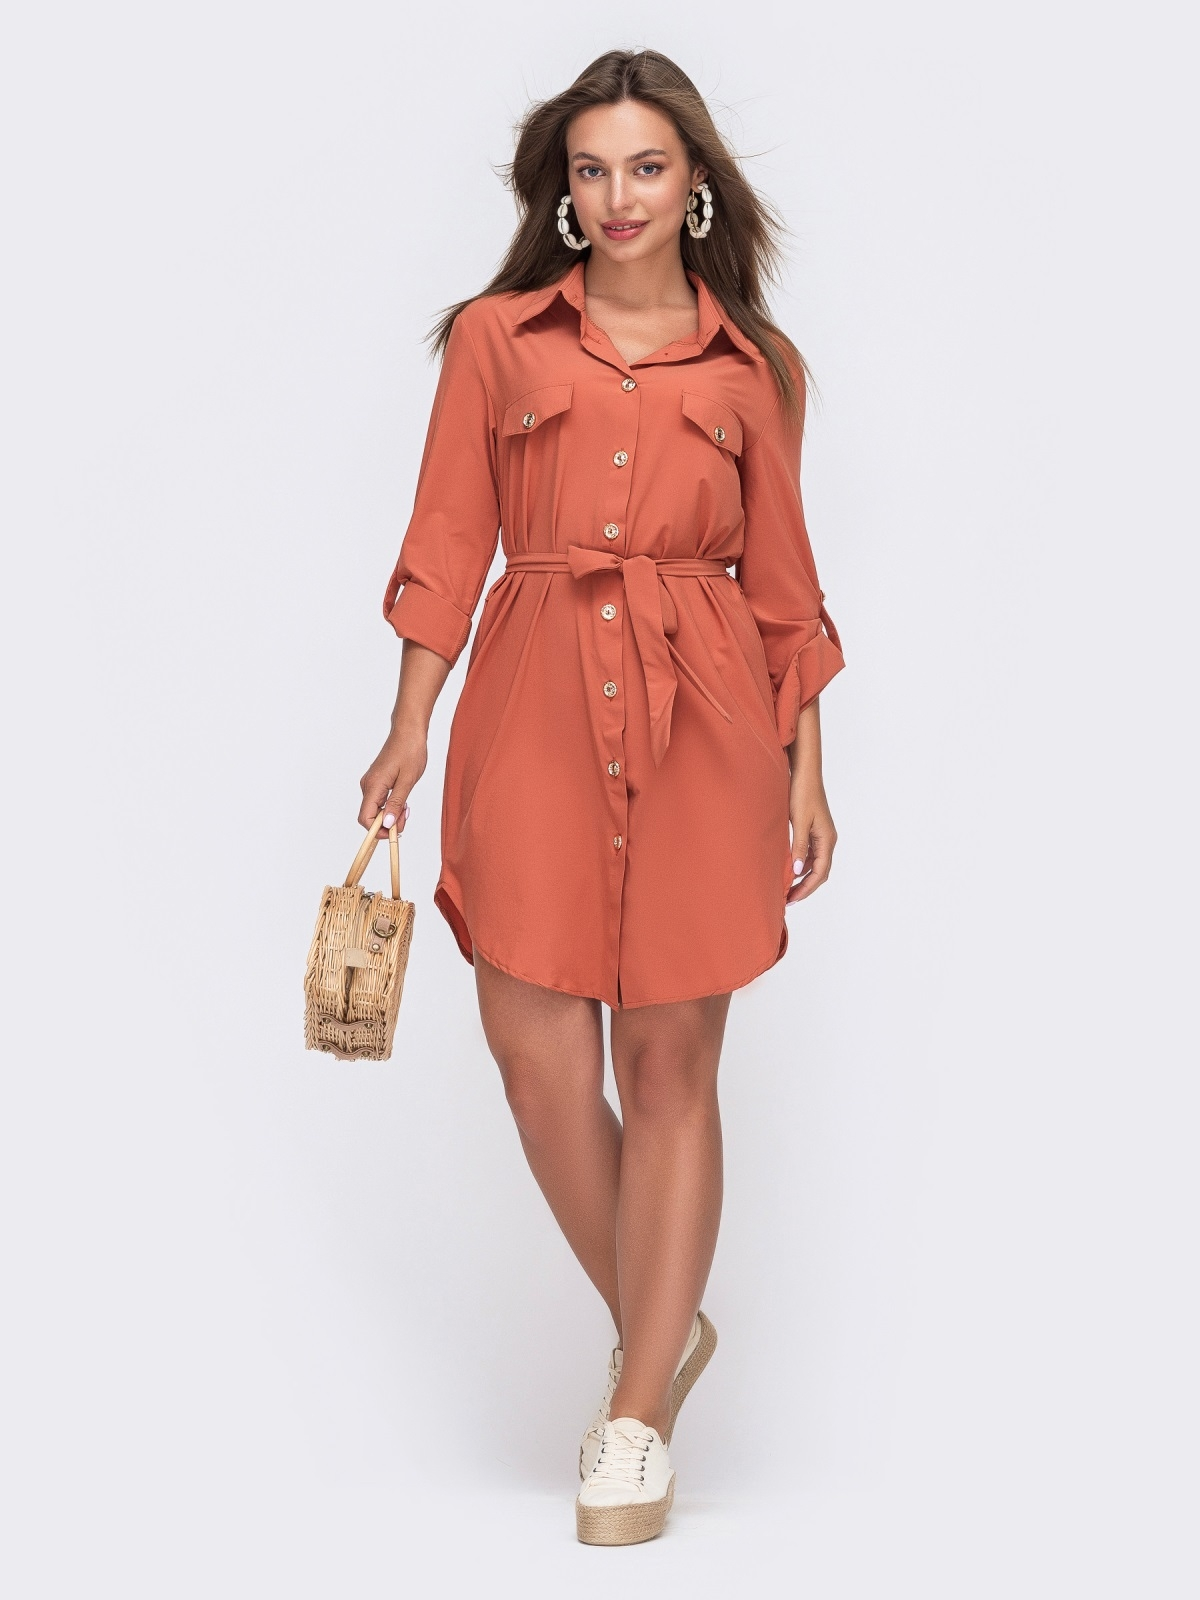 Коралловое платье-рубашка с клапанами на полочке 49539, фото 1